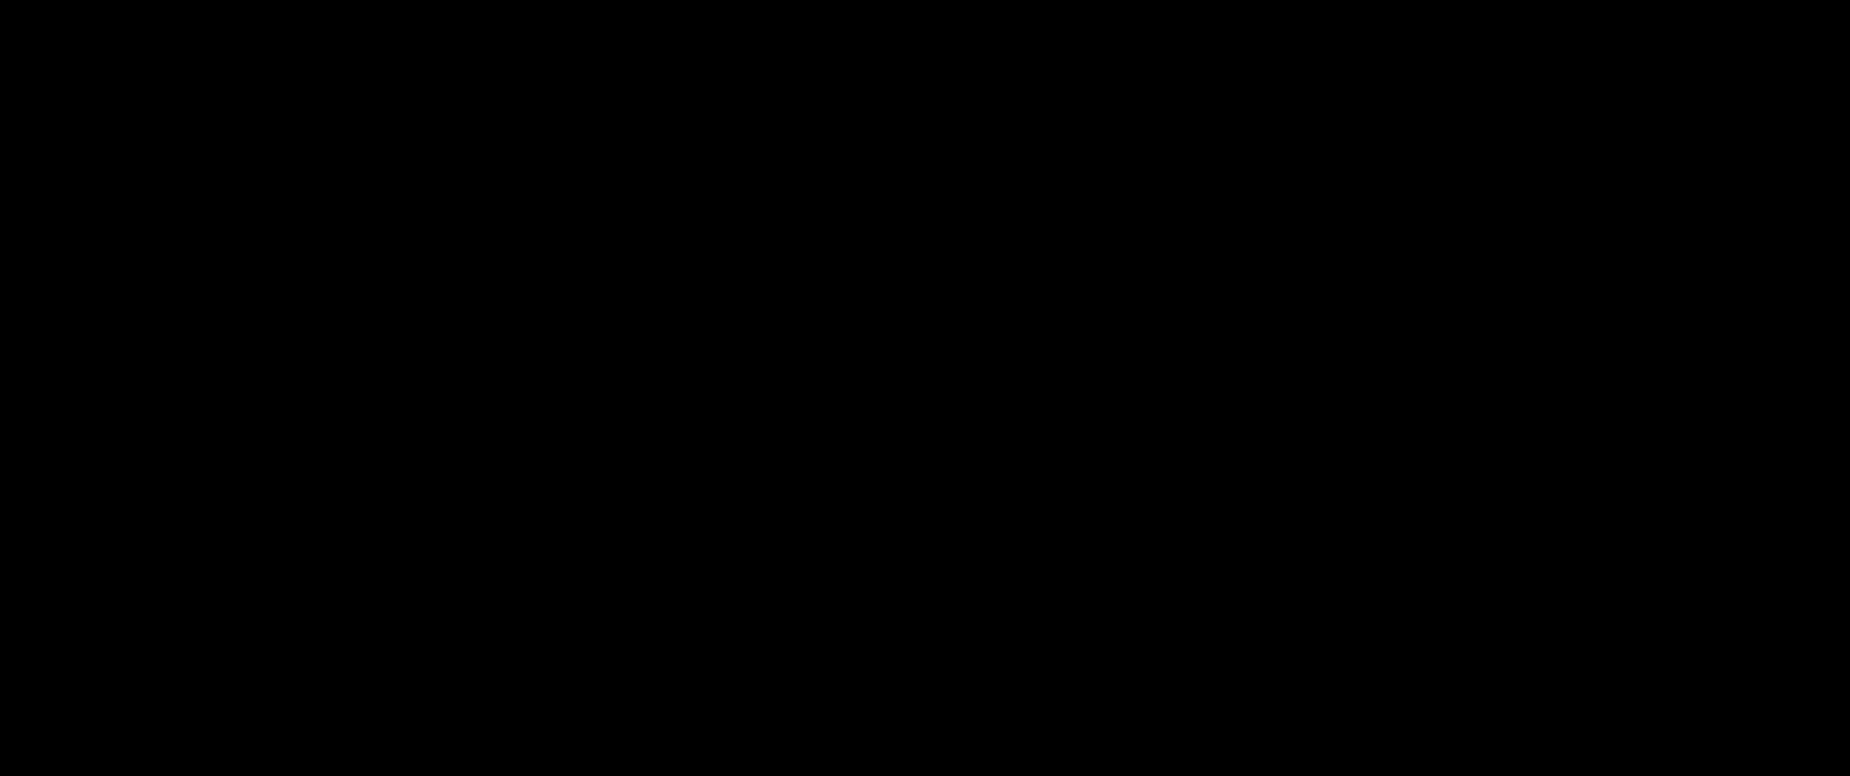 quadro-medidas-gabioes-malha-hexagonal-final